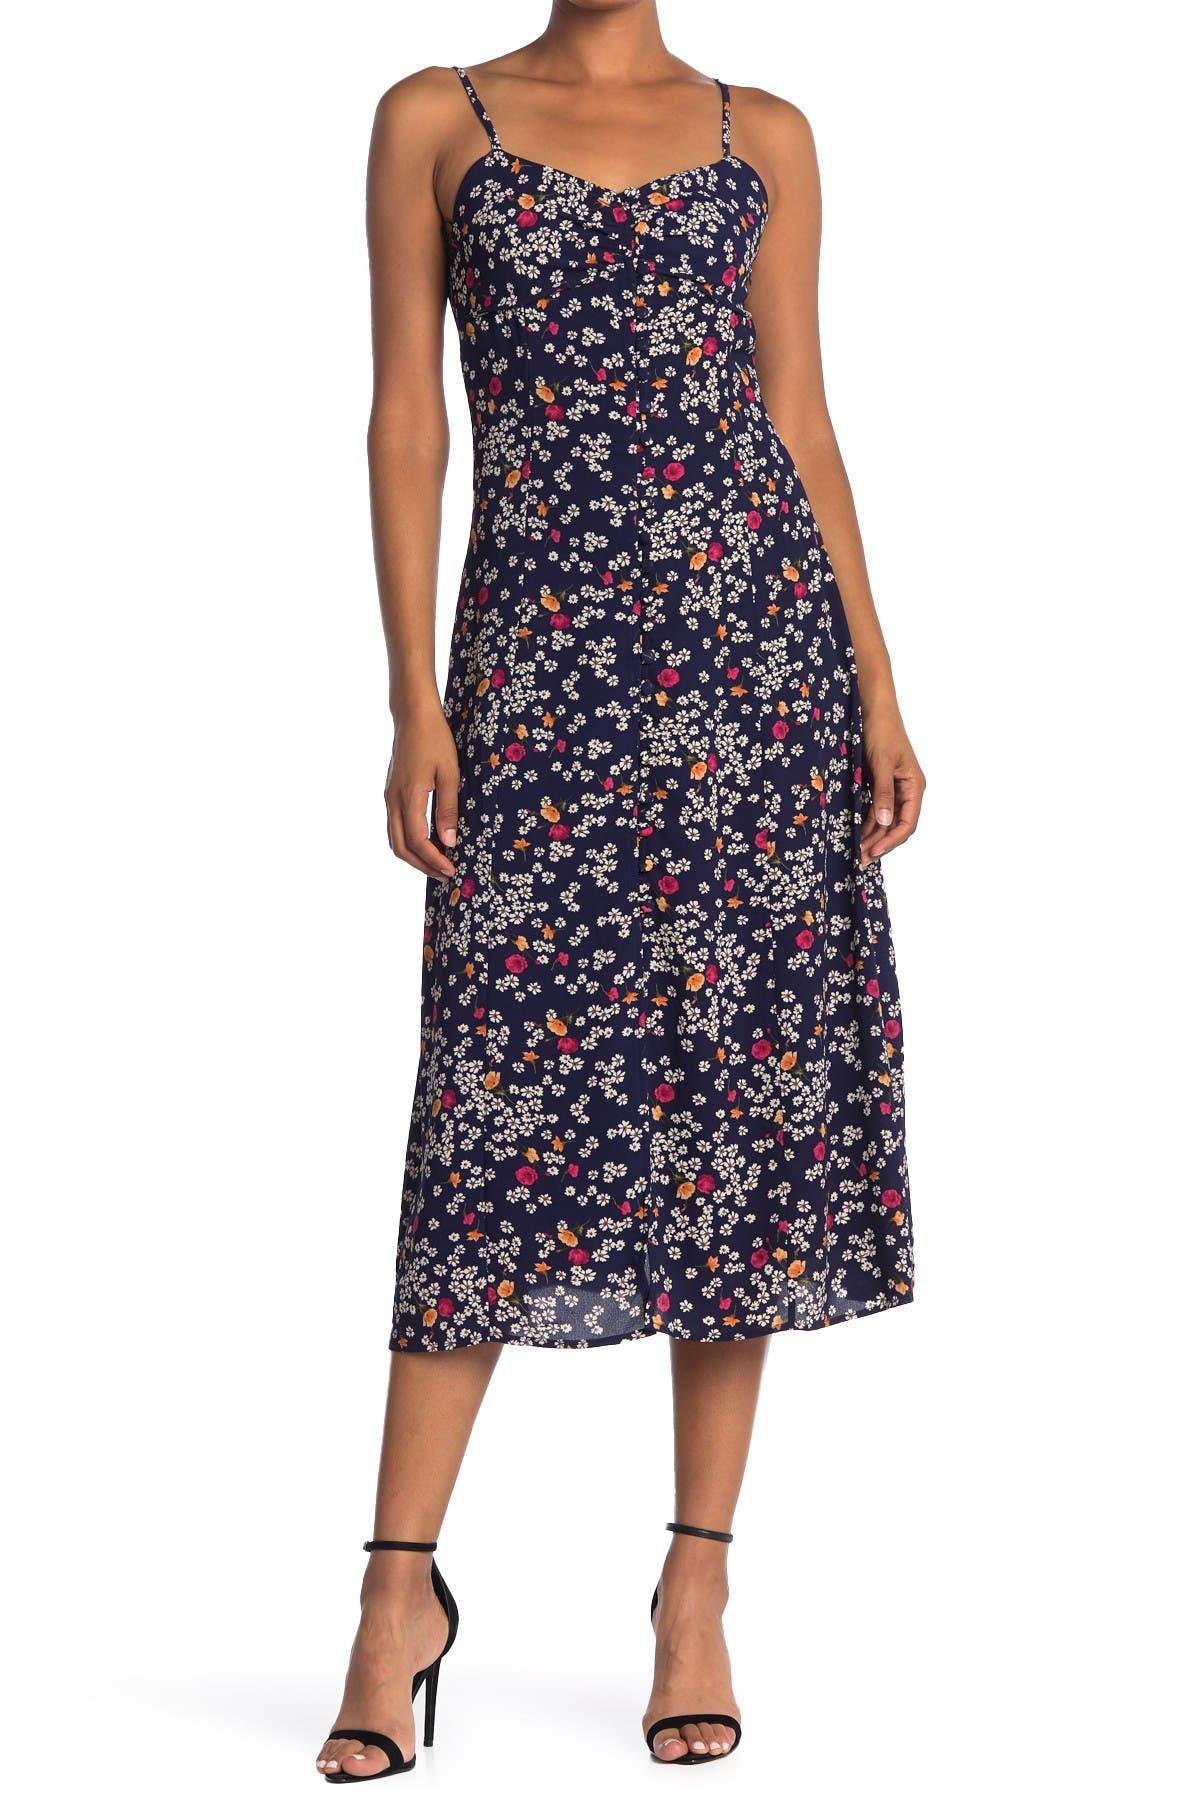 Image of HYFVE Floral Print Button Down Midi Dress